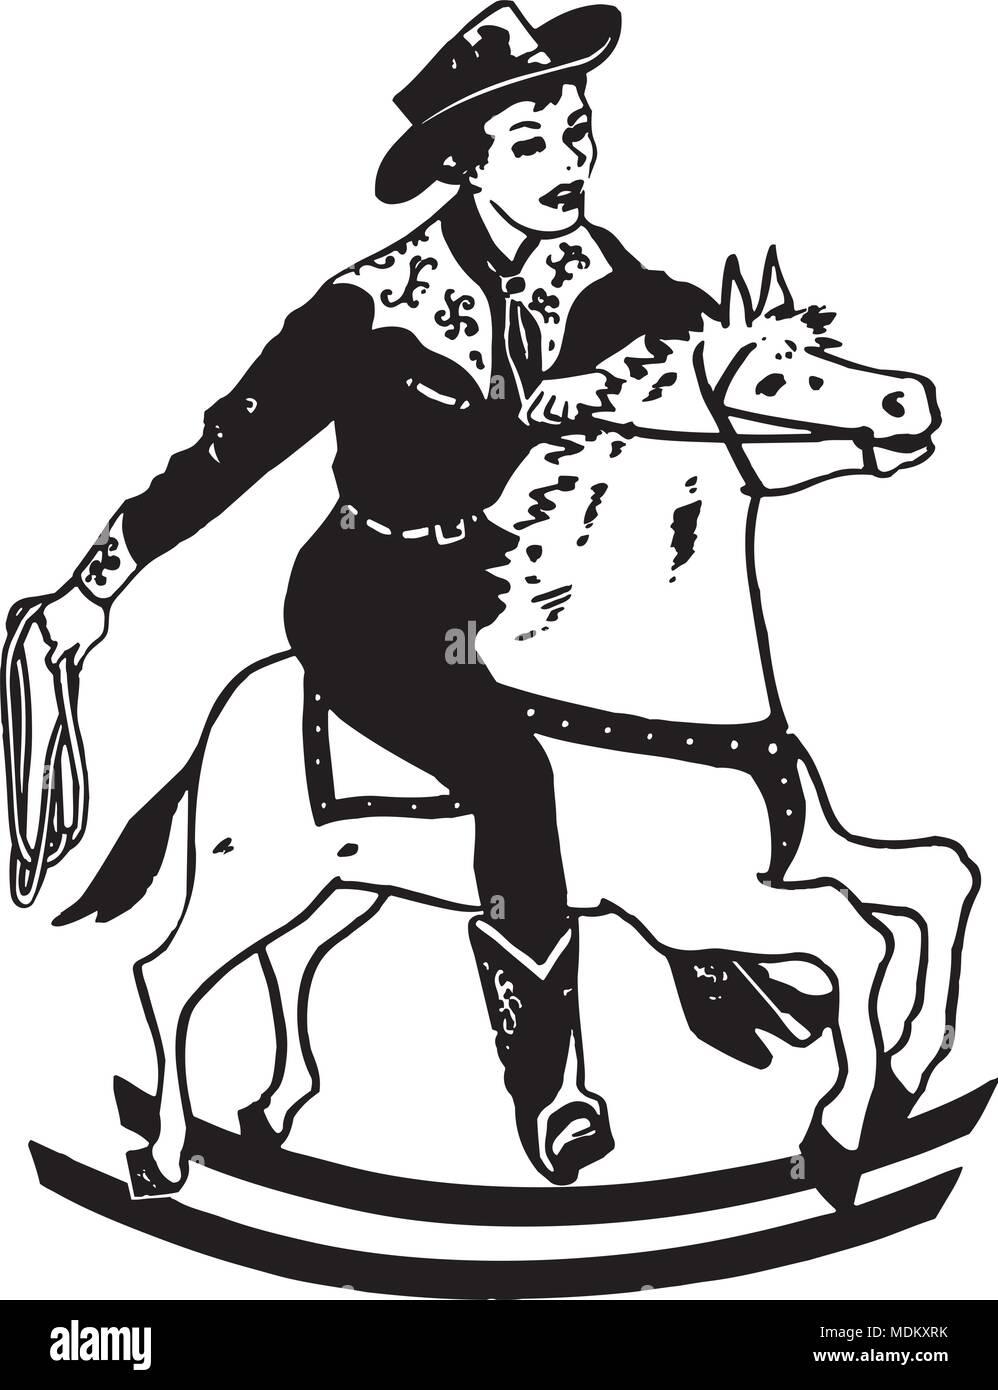 medium resolution of boy on rocking horse retro clipart illustration